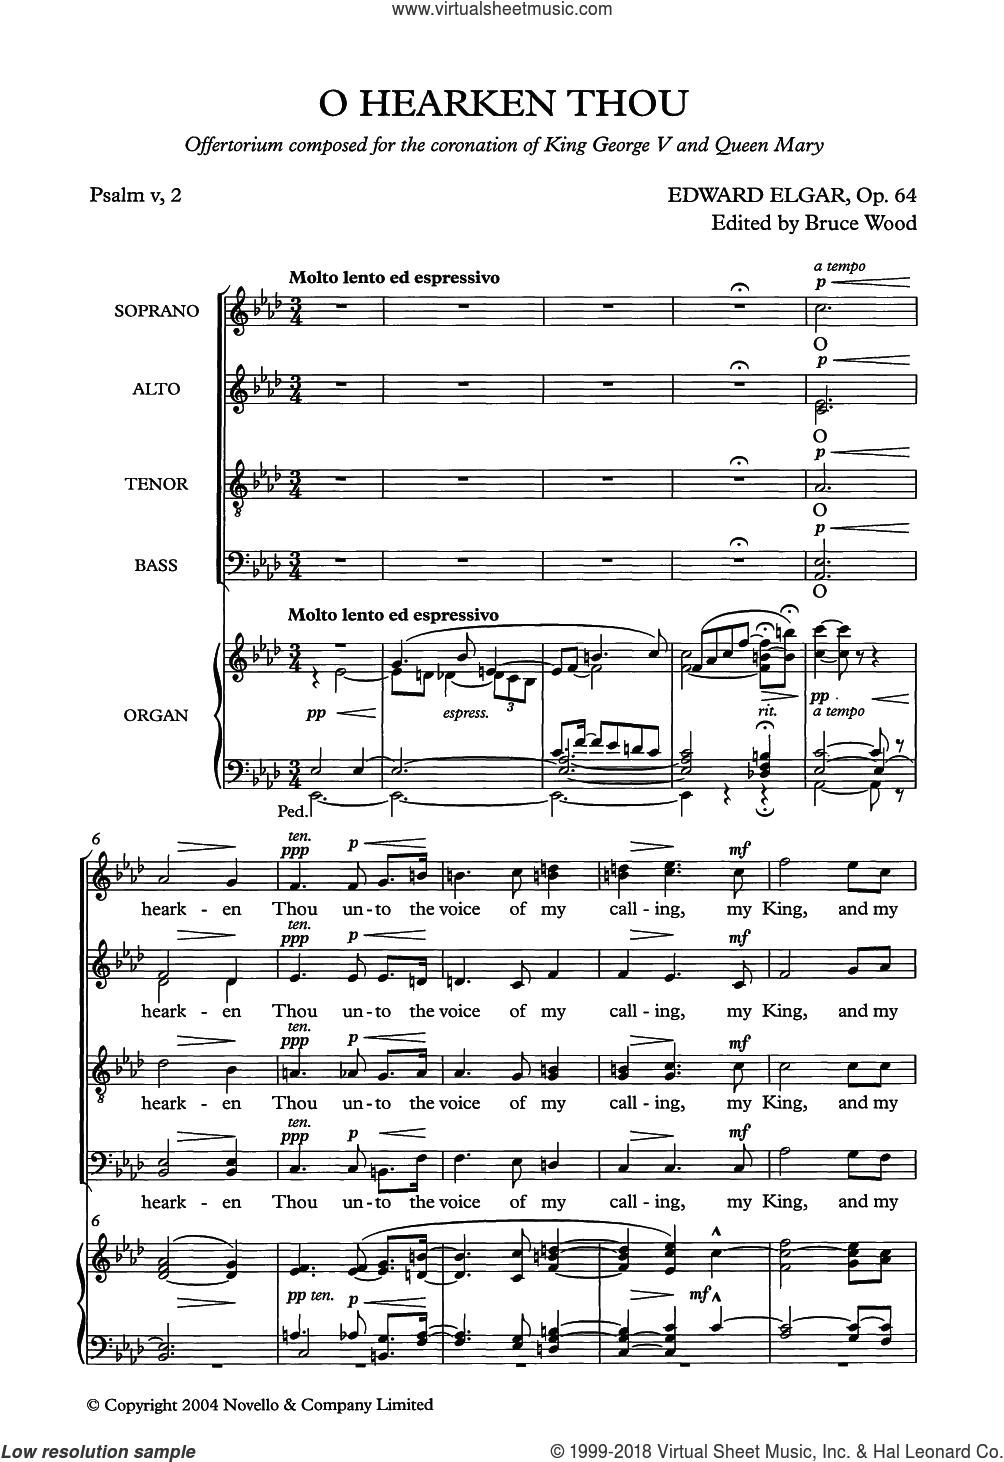 O Hearken Thou sheet music for choir by Edward Elgar, classical score, intermediate skill level